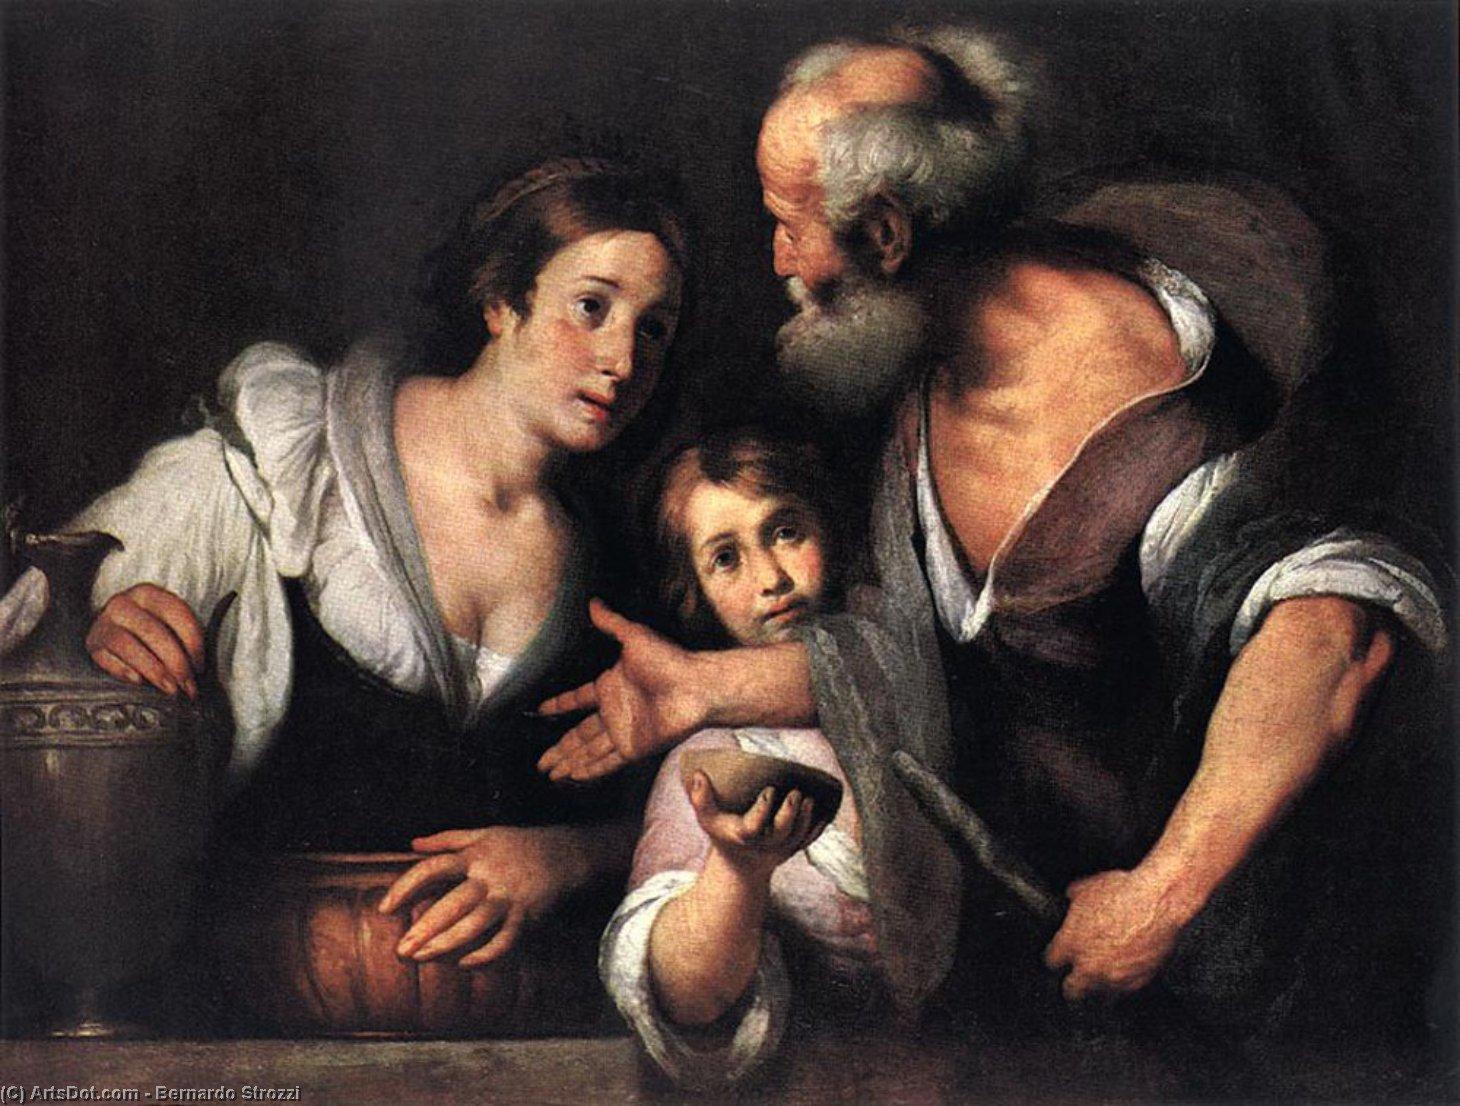 Wikioo.org - The Encyclopedia of Fine Arts - Painting, Artwork by Bernardo Strozzi - Prophet Elijah and the Widow of Sarepta